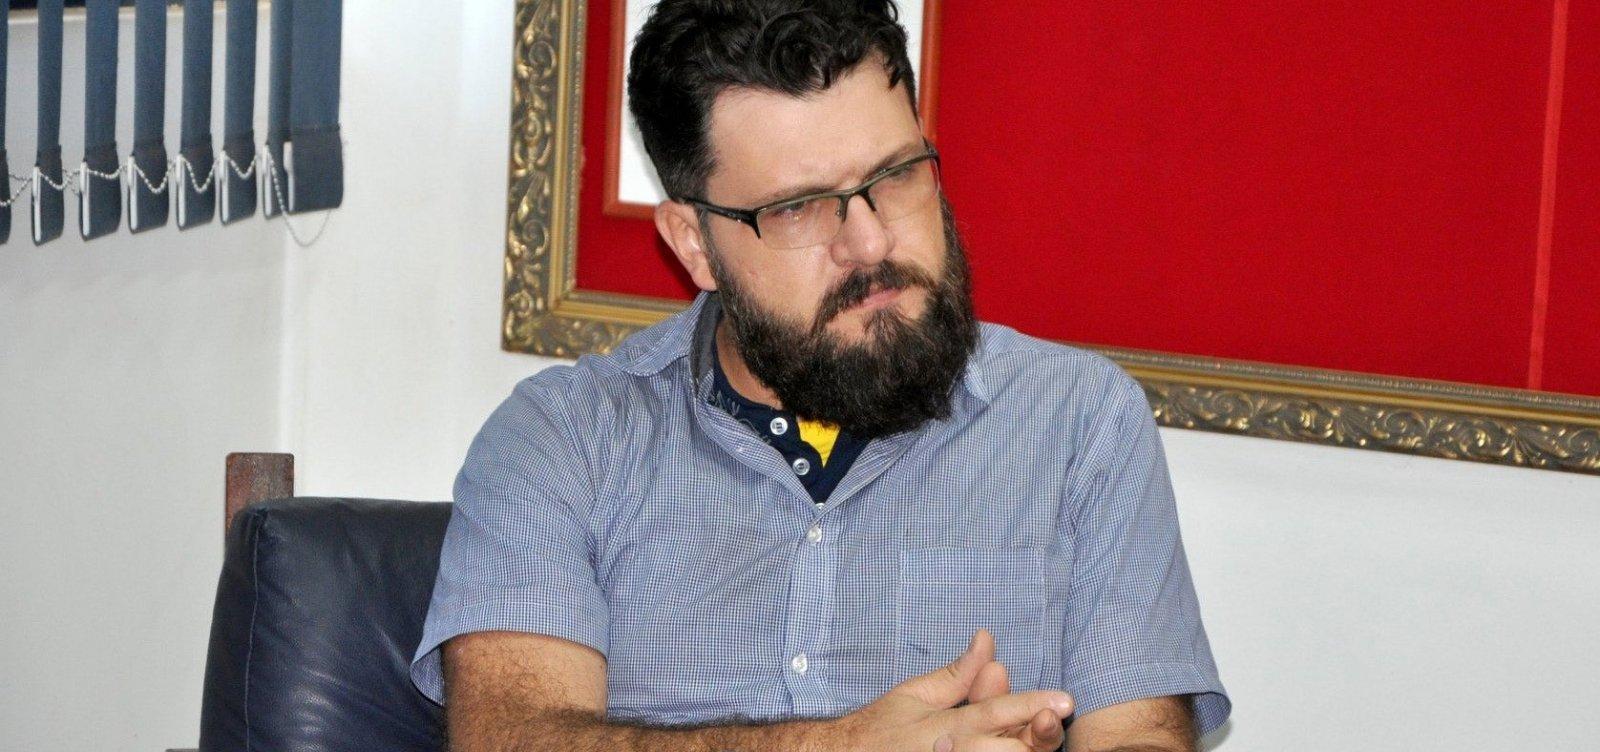 [Apoiador de Bolsonaro, antropólogo é preso ao tentar impedir trabalho do Ibama]